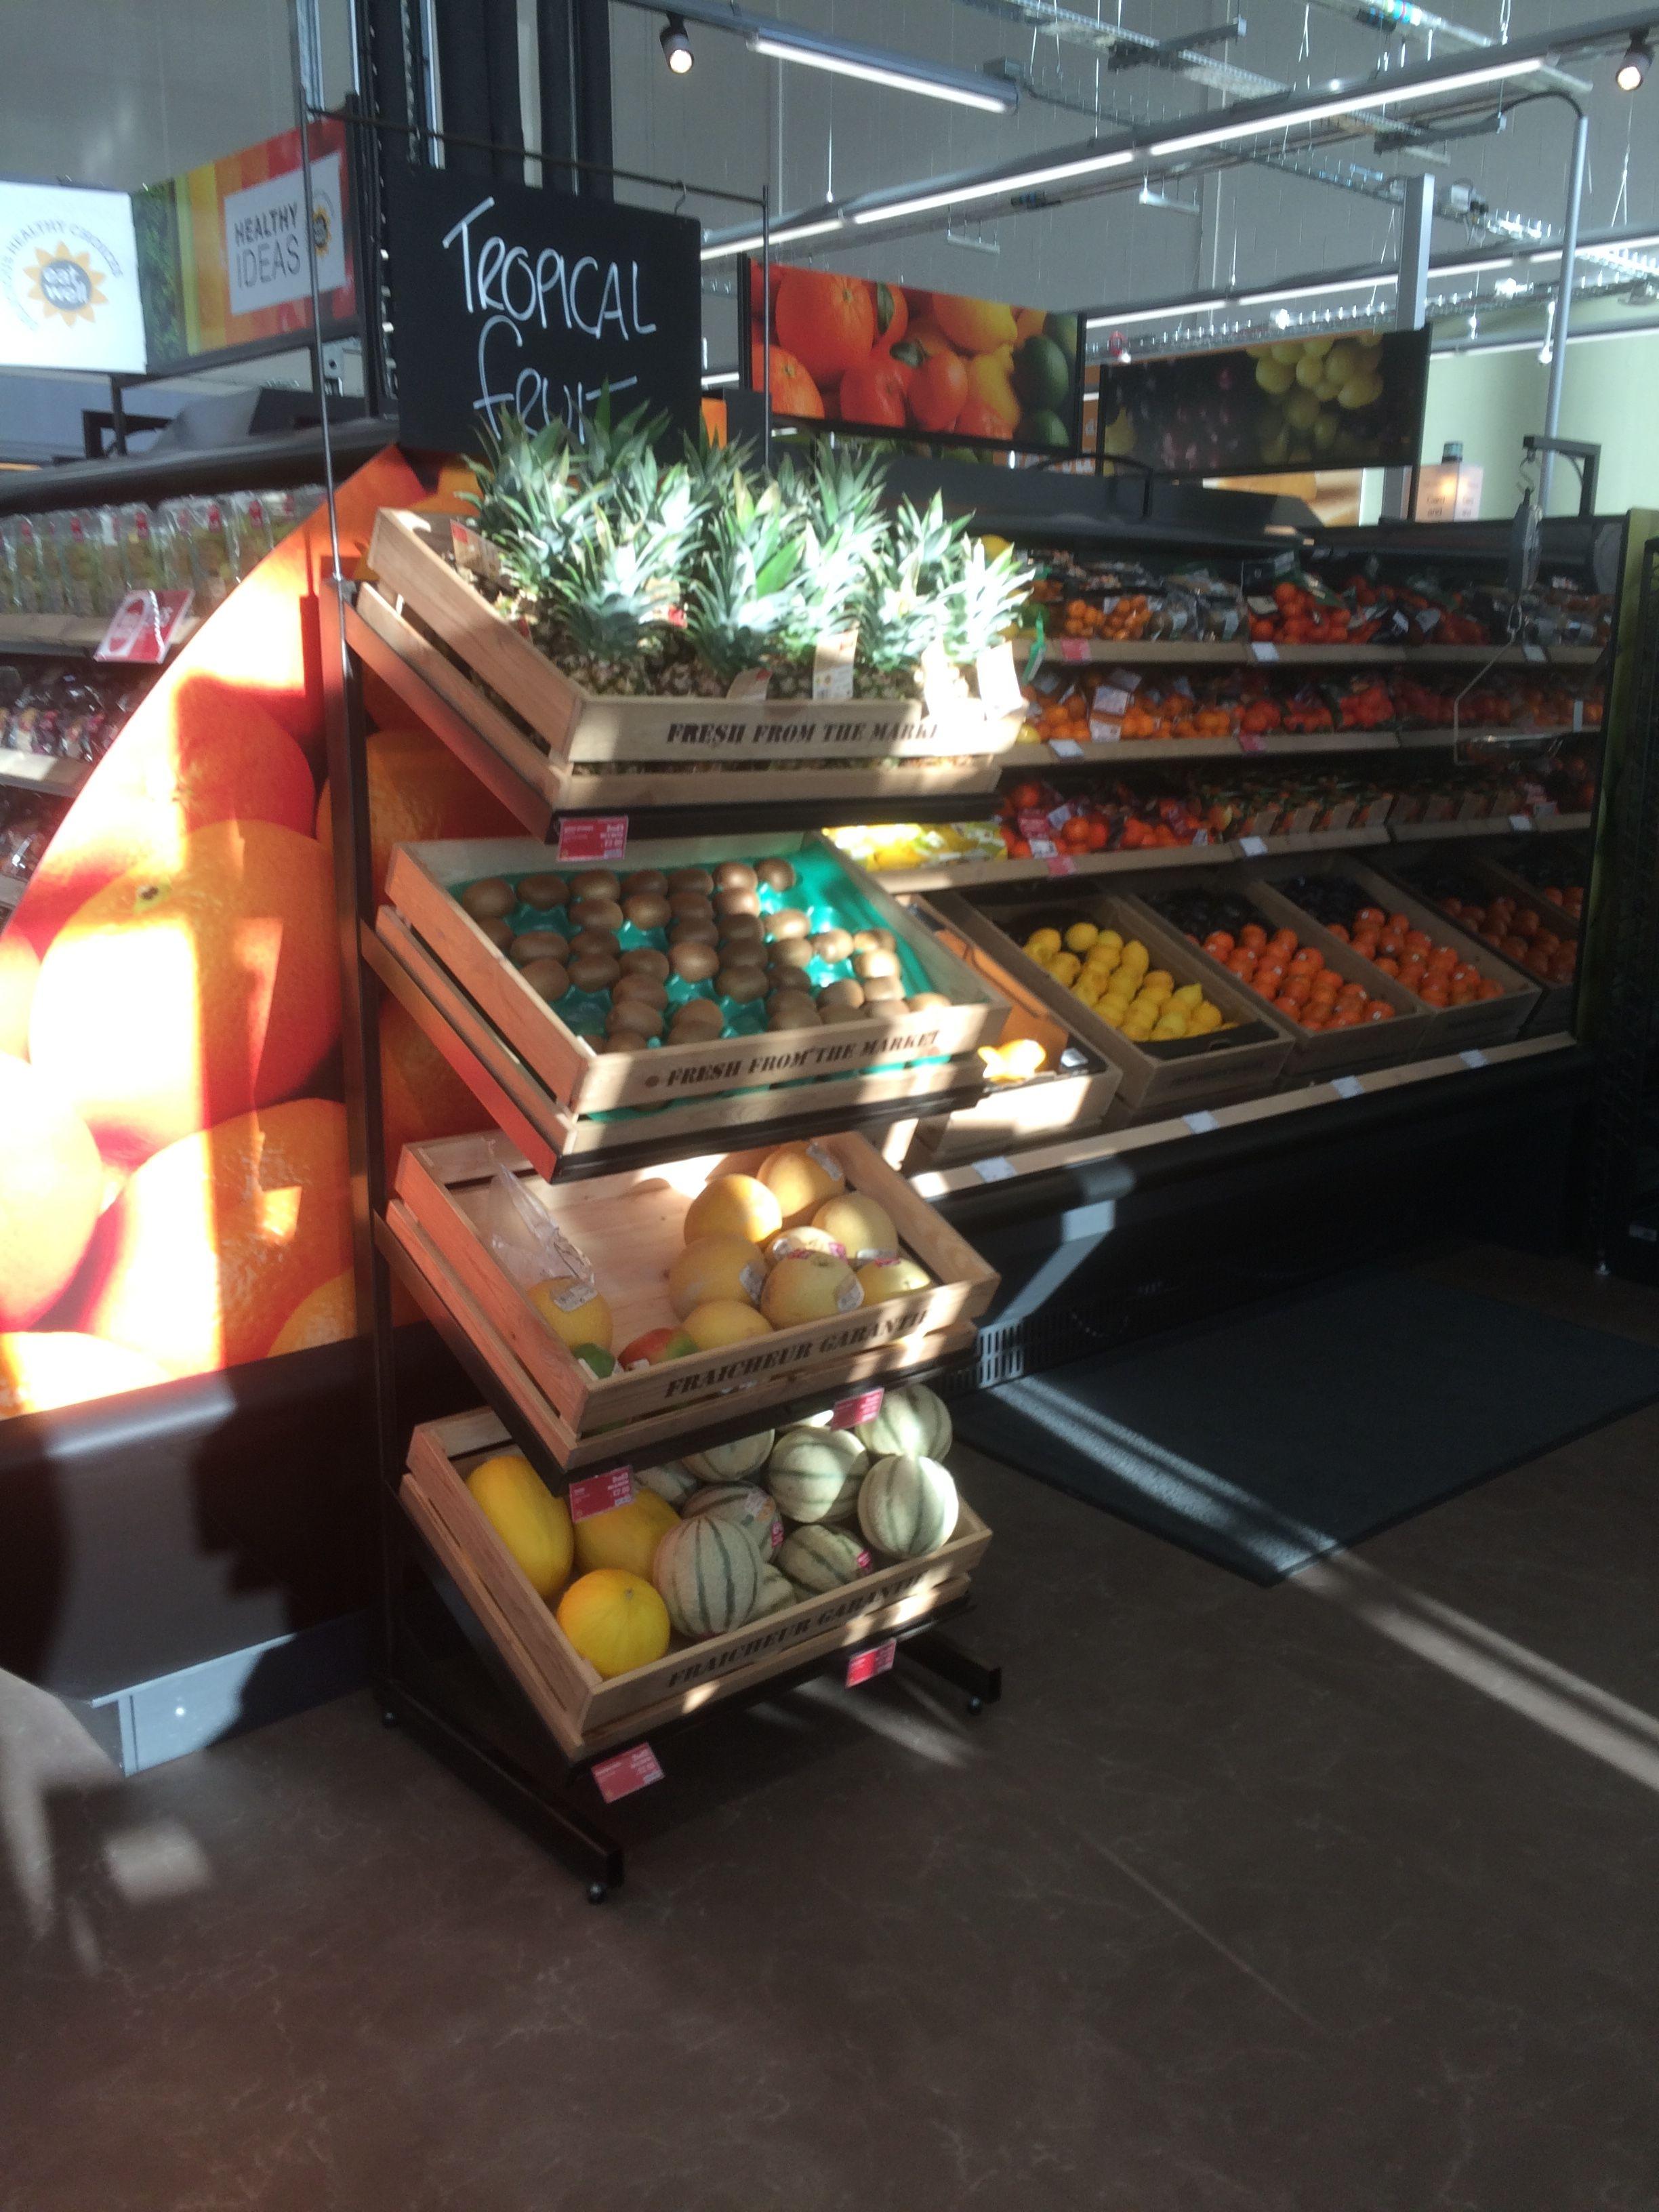 M S Foodhall Netherfield Nottingham Food Fresh Produce